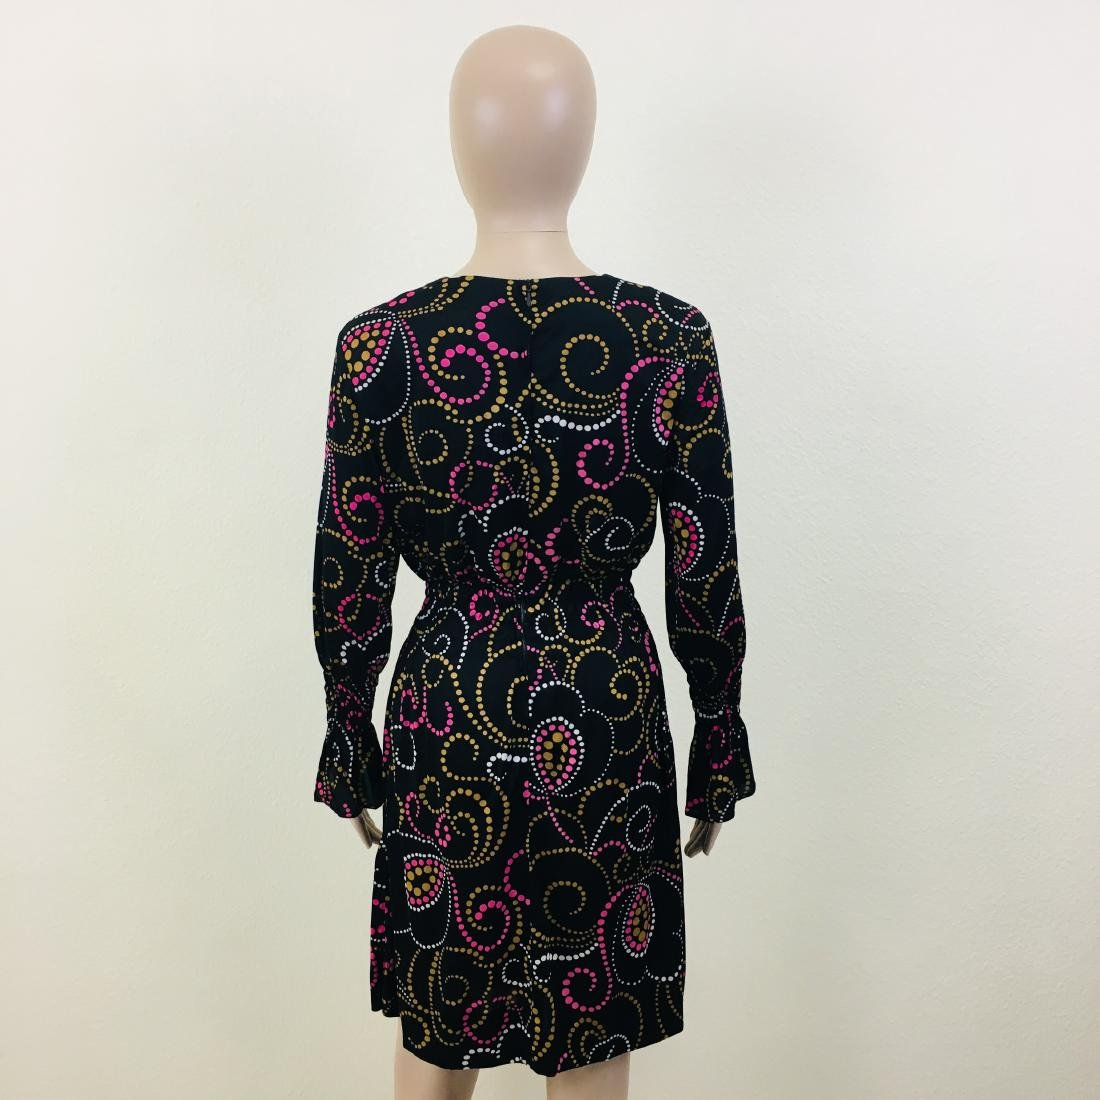 Vintage Women's Black Dress - 7